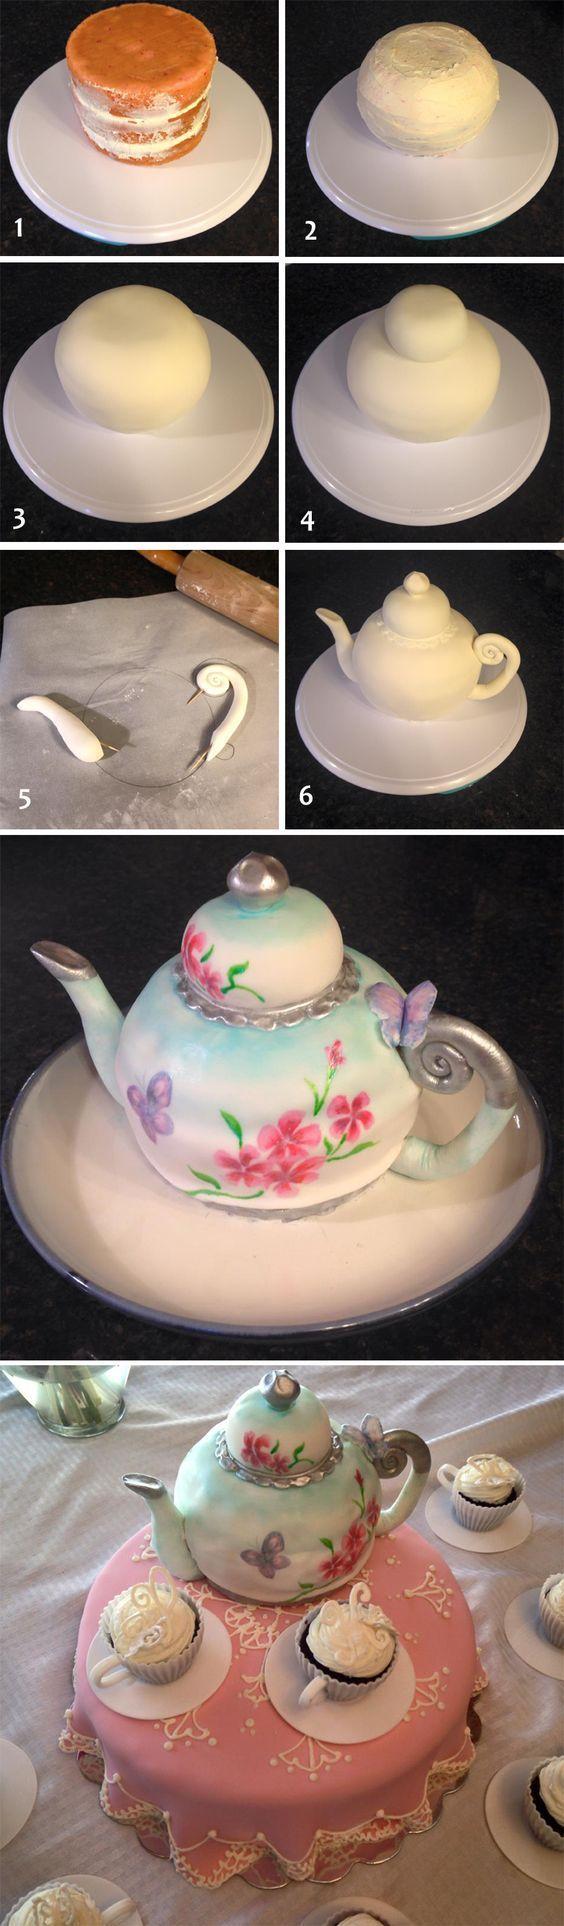 Teapot Cake Tutorial Watch The Video It's Easy #cakedecoratingtutorials